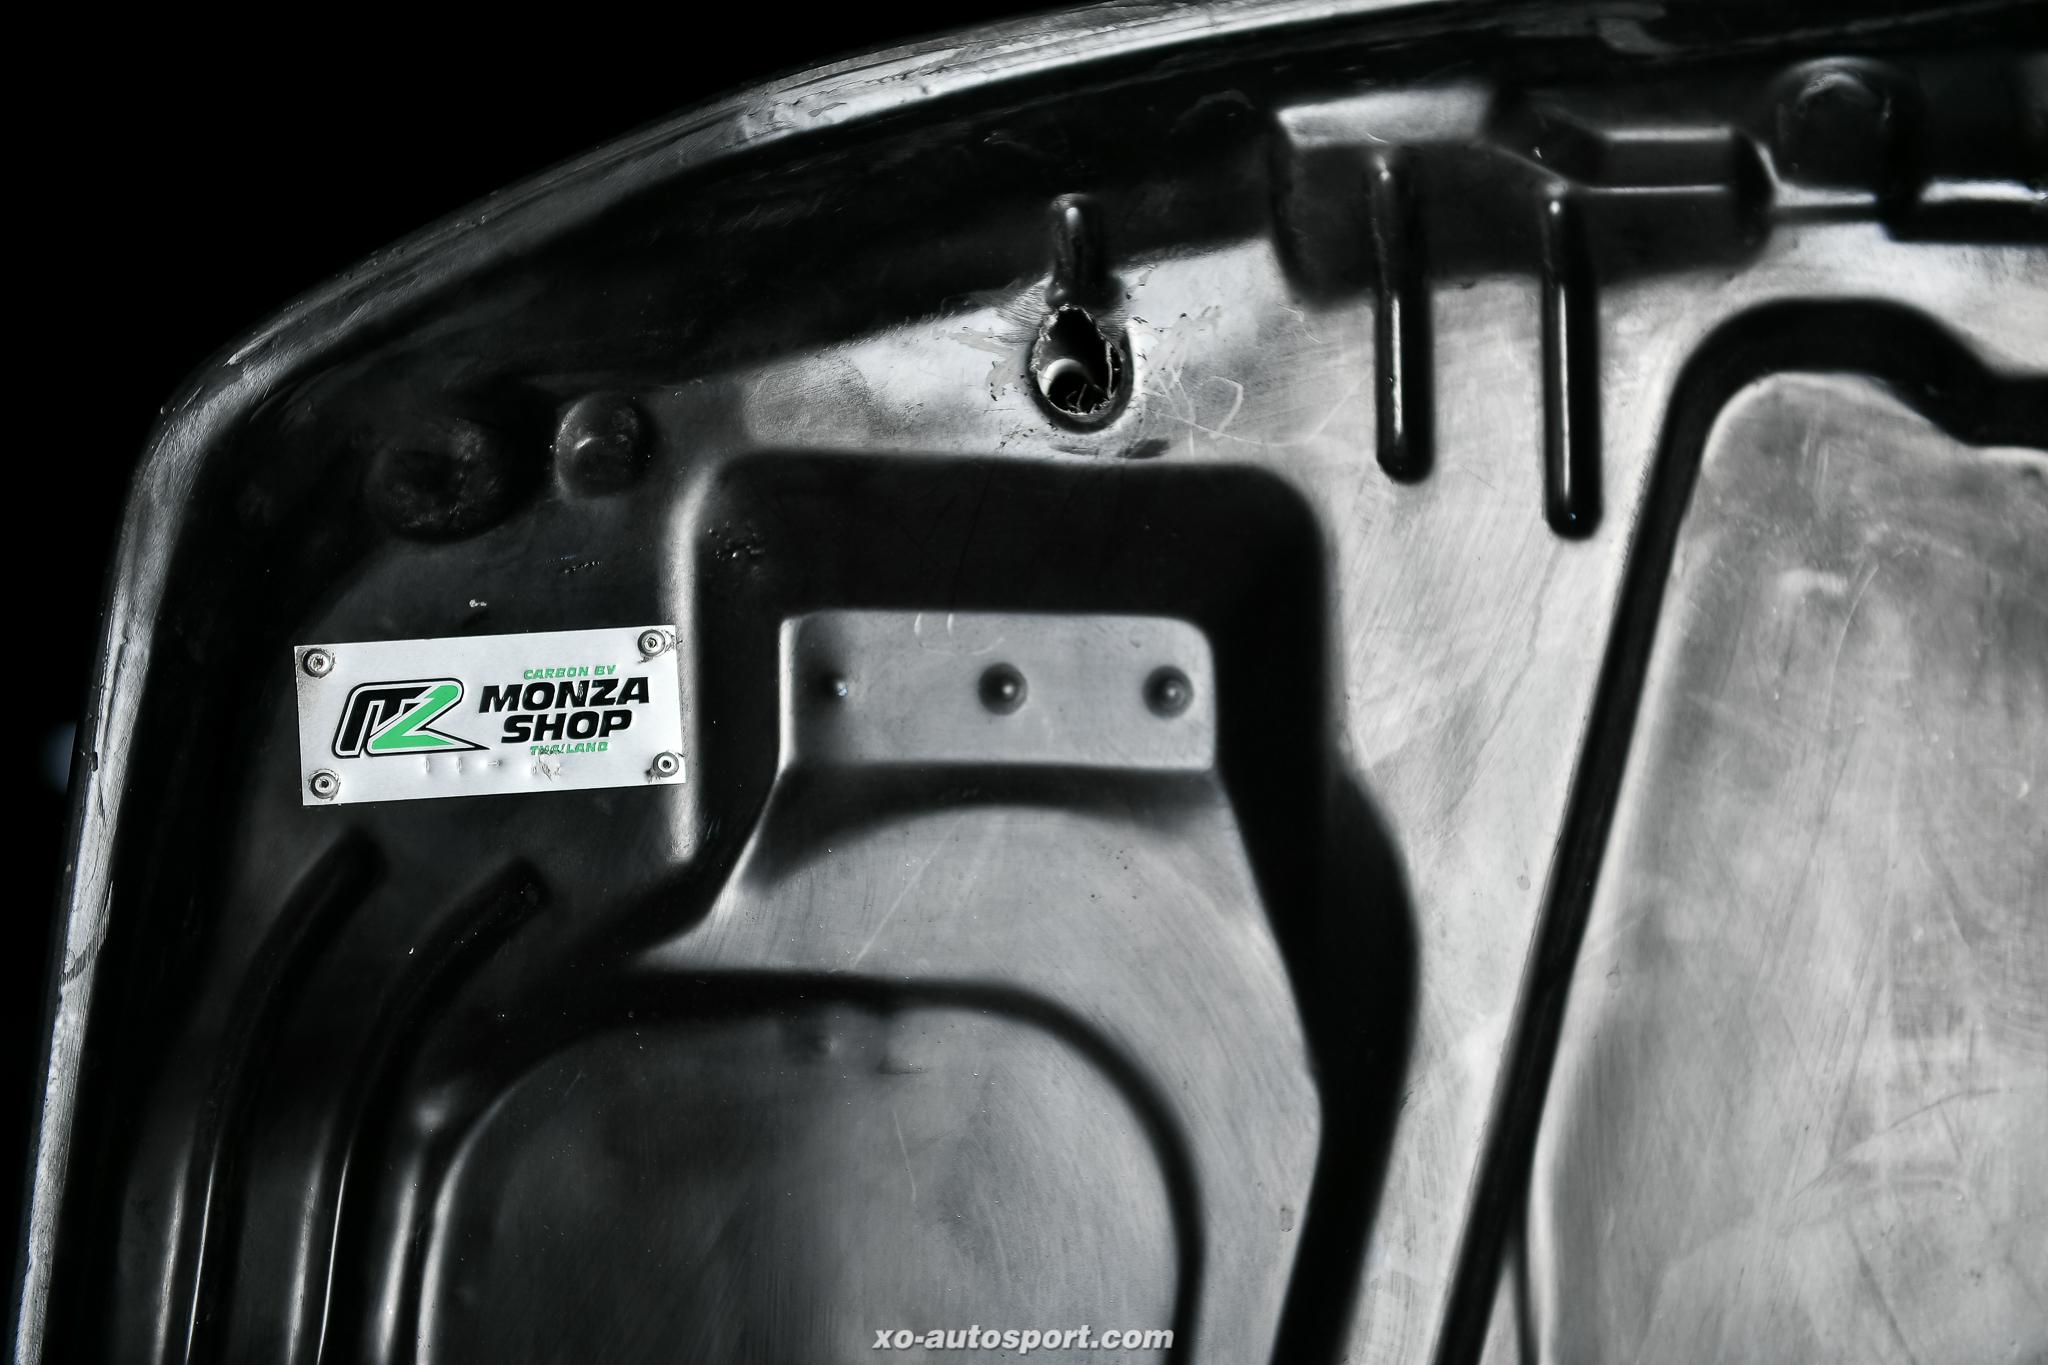 INTEGRA DC2 PRO 4 FWD Champion by FLOW LAB CNC 12